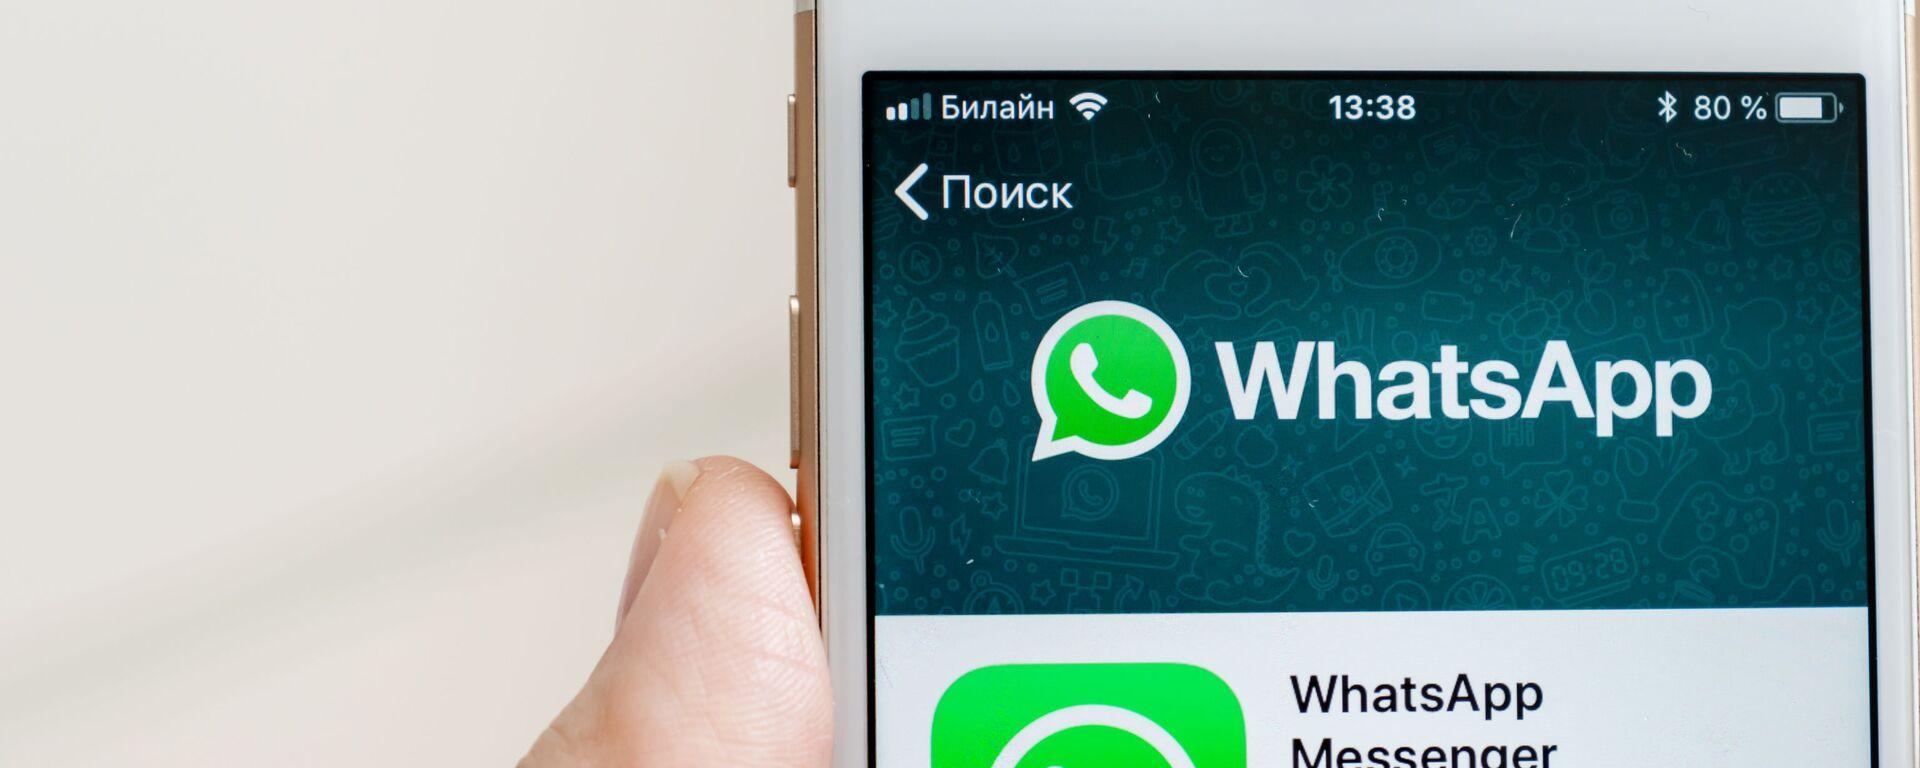 Aplikace WhatsApp an telefonu - Sputnik Česká republika, 1920, 25.08.2021